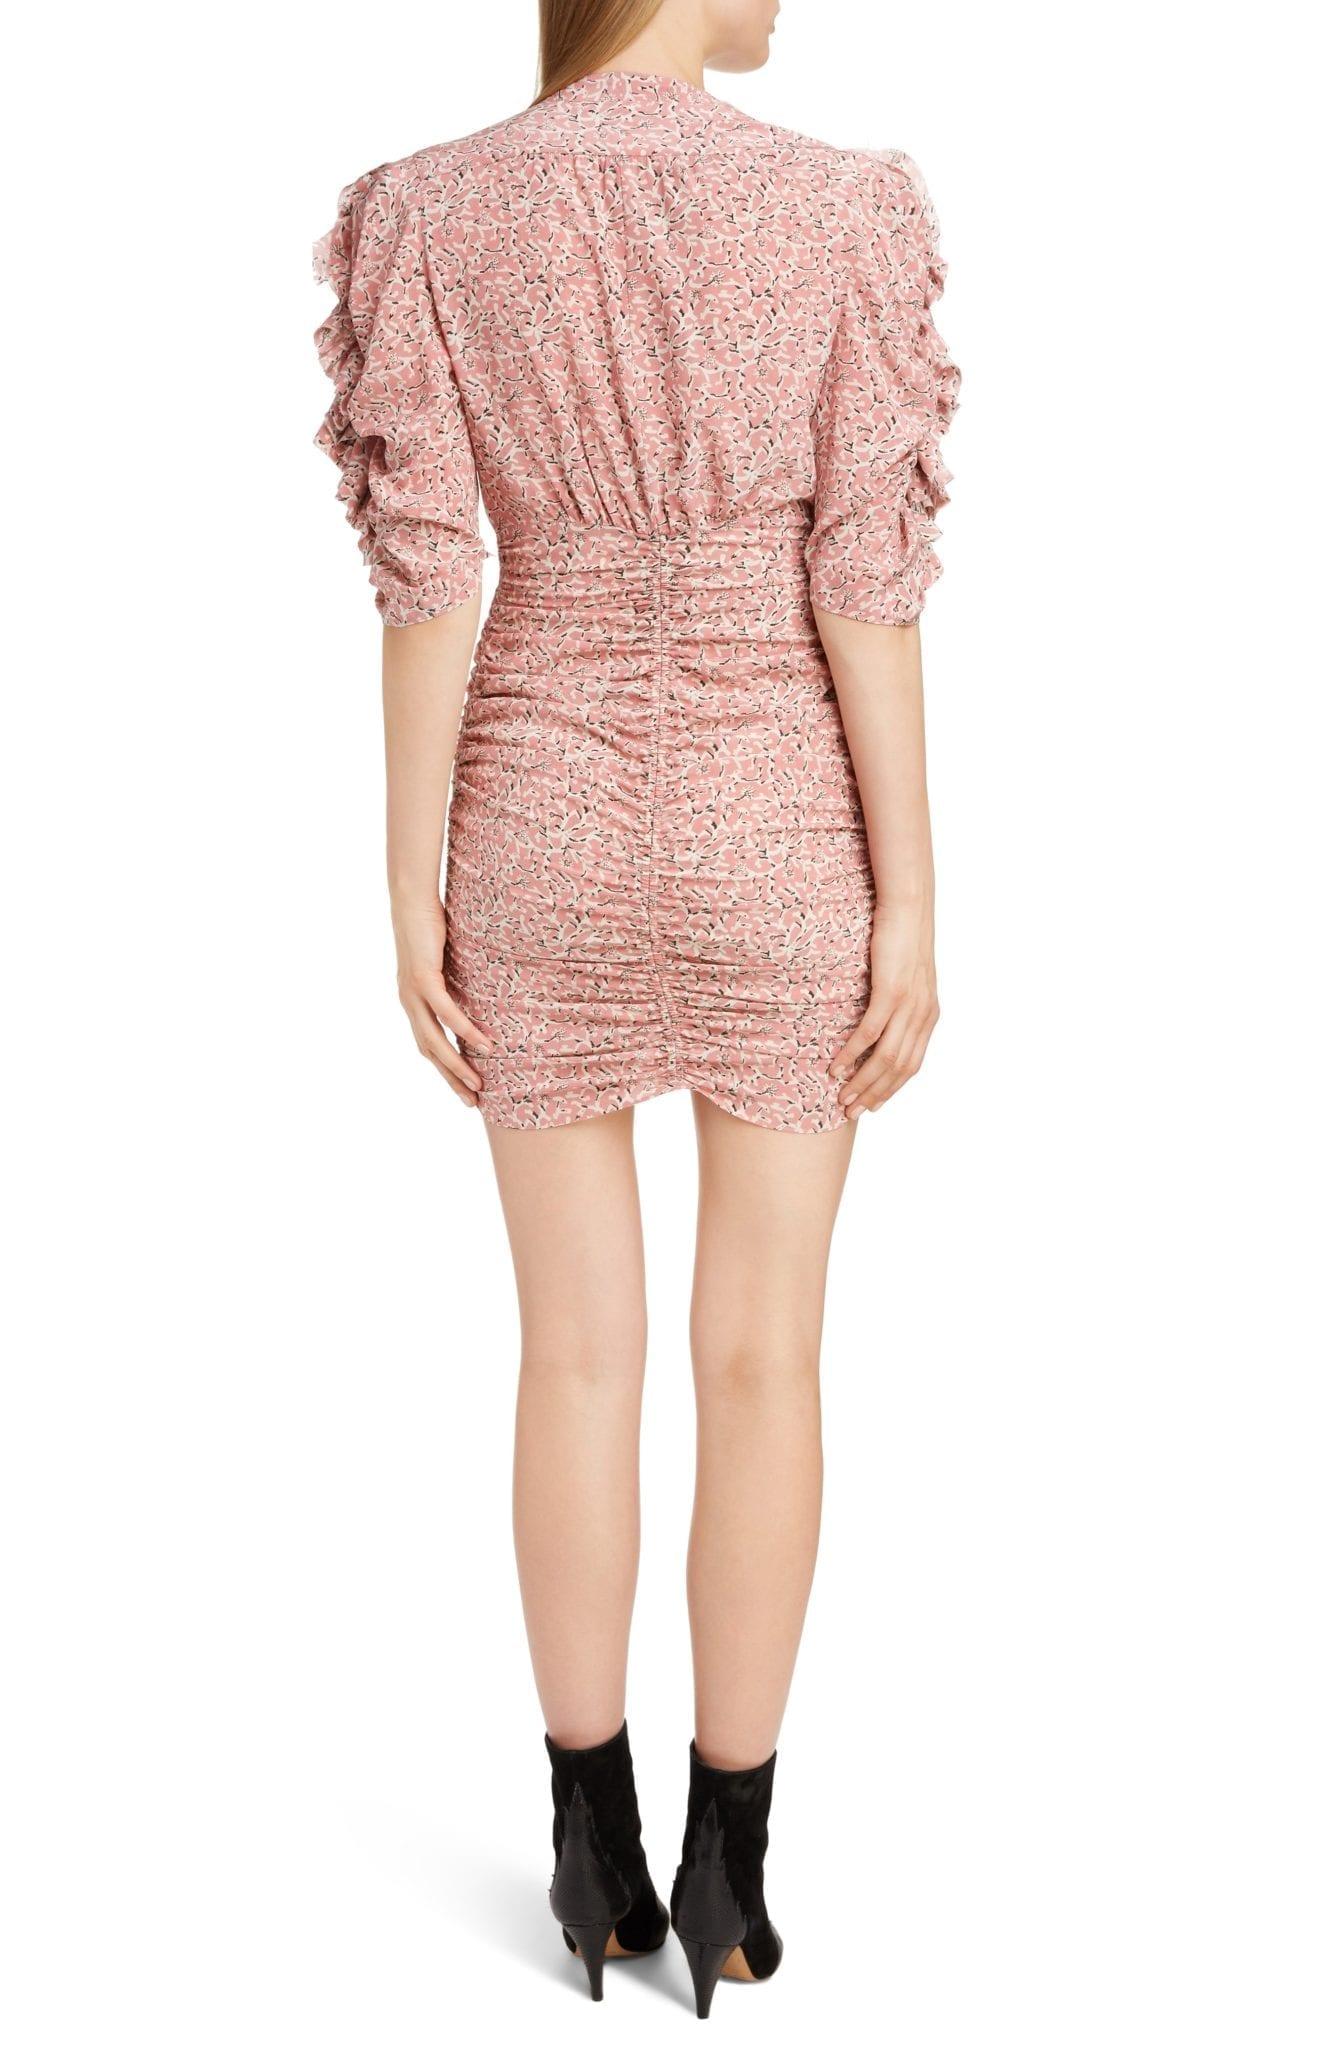 15a5552a91f ISABEL MARANT Print Silk Puff Sleeve Pink Dress - We Select Dresses